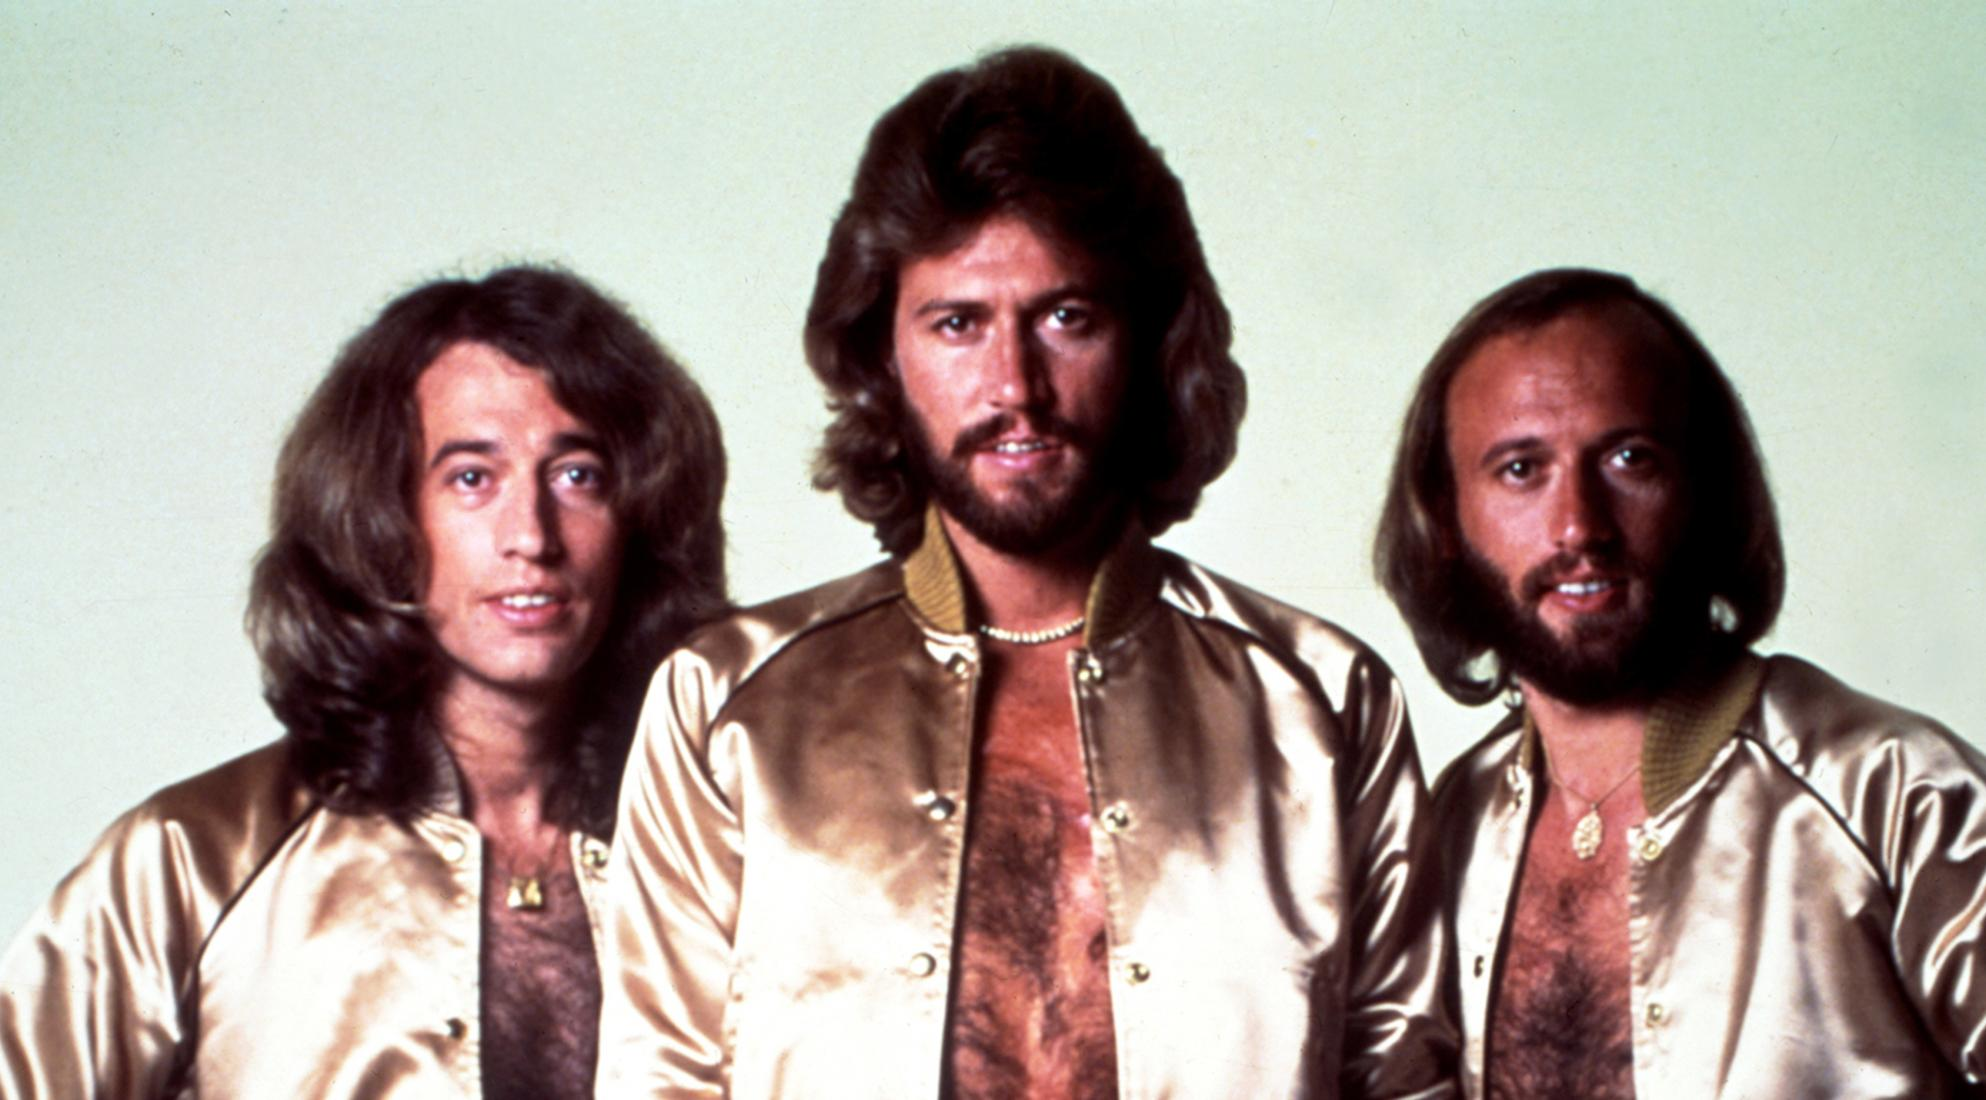 Lagu Bee Gees - How Deep Is Your Love